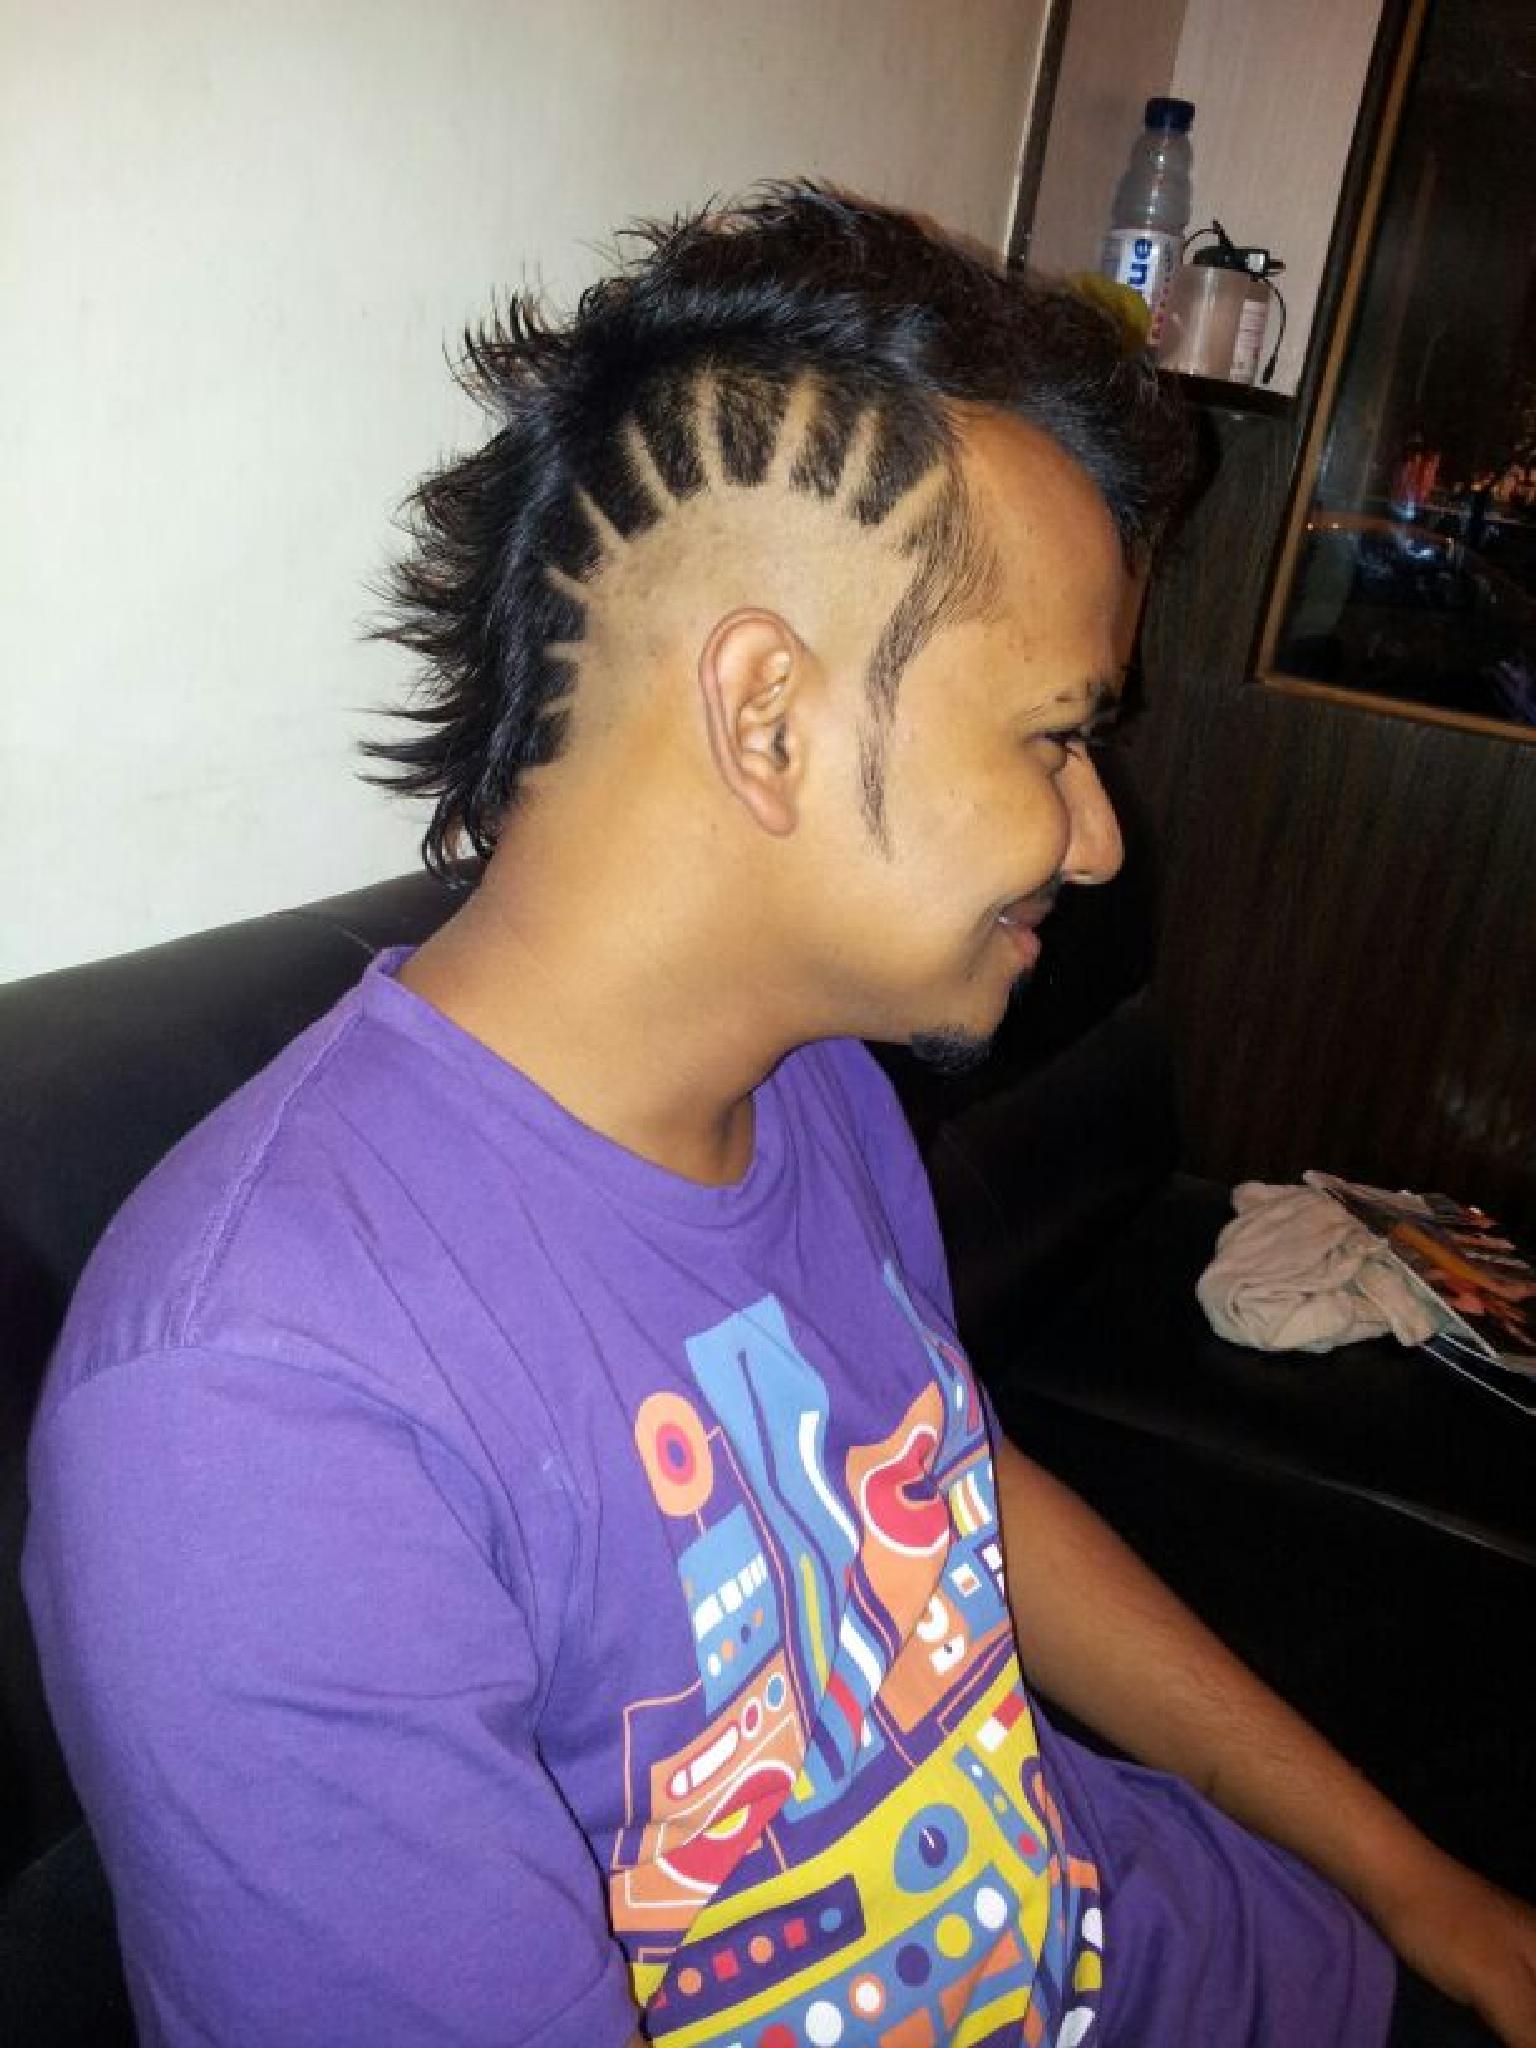 hair style by Ankush Kumar Paliyal